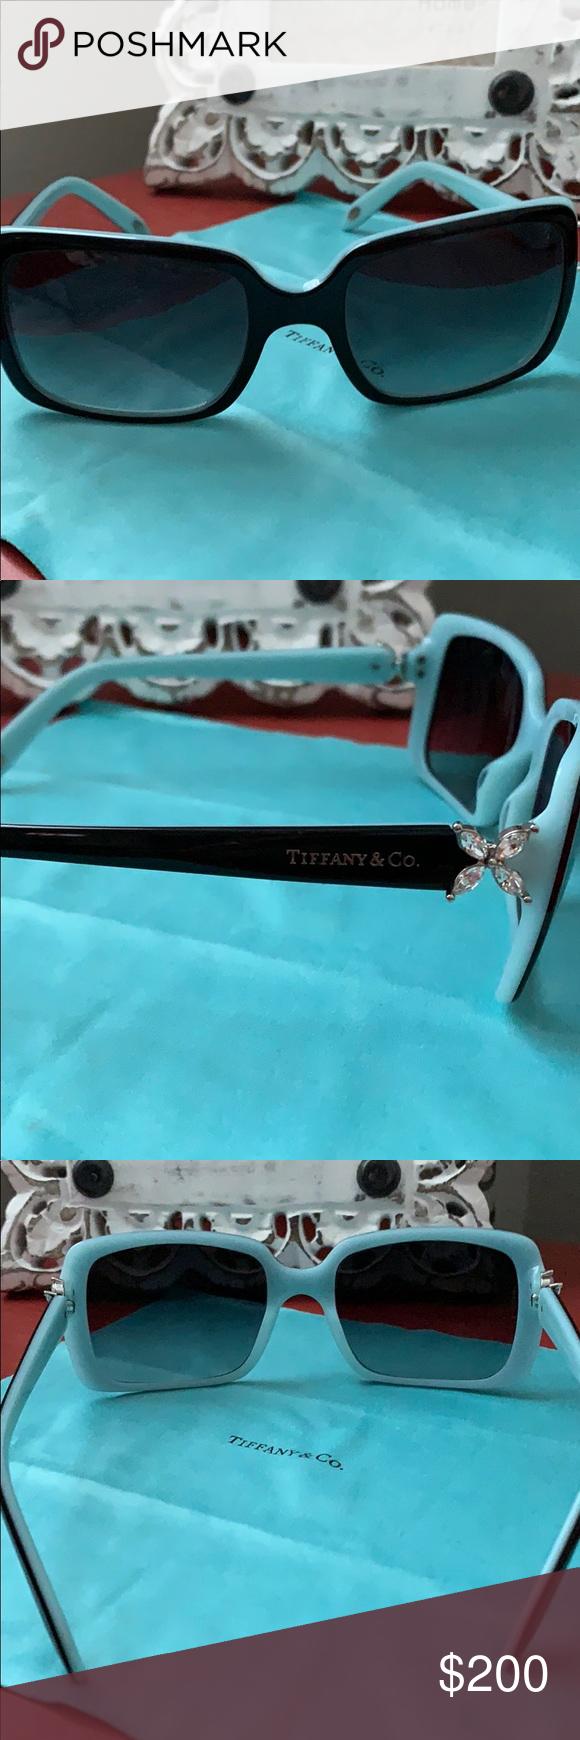 49d5828bba0f Tiffany   Co. Sunglasses (Authentic) Original Tiffany   Co. sunglasses